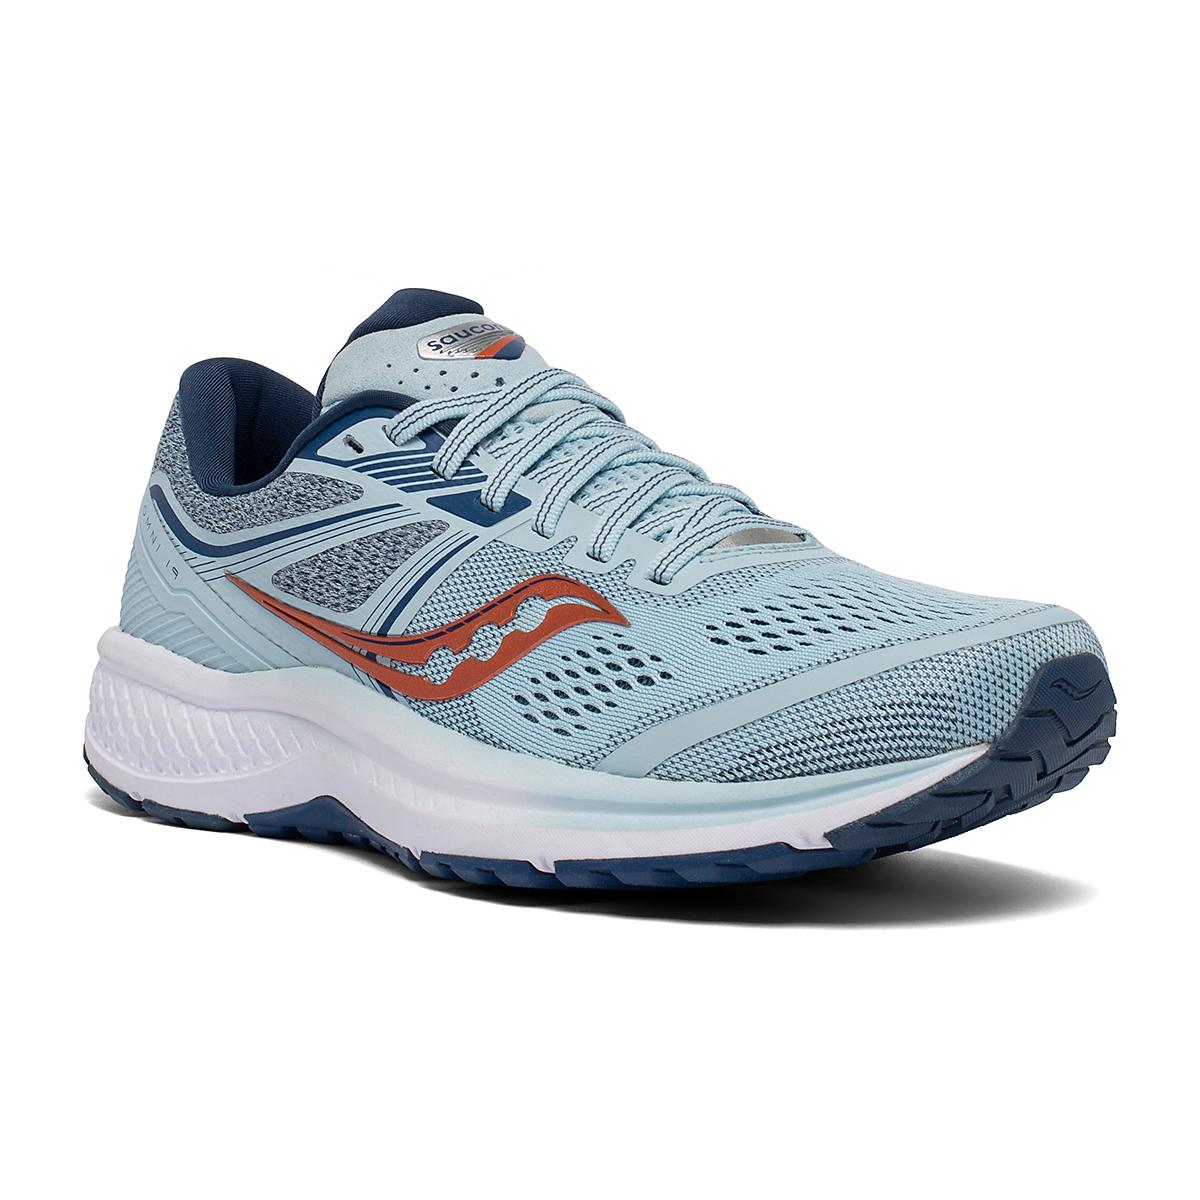 Women's Saucony Omni 19 Running Shoe - Color: Sky/Storm - Size: 5 - Width: Regular, Sky/Storm, large, image 3